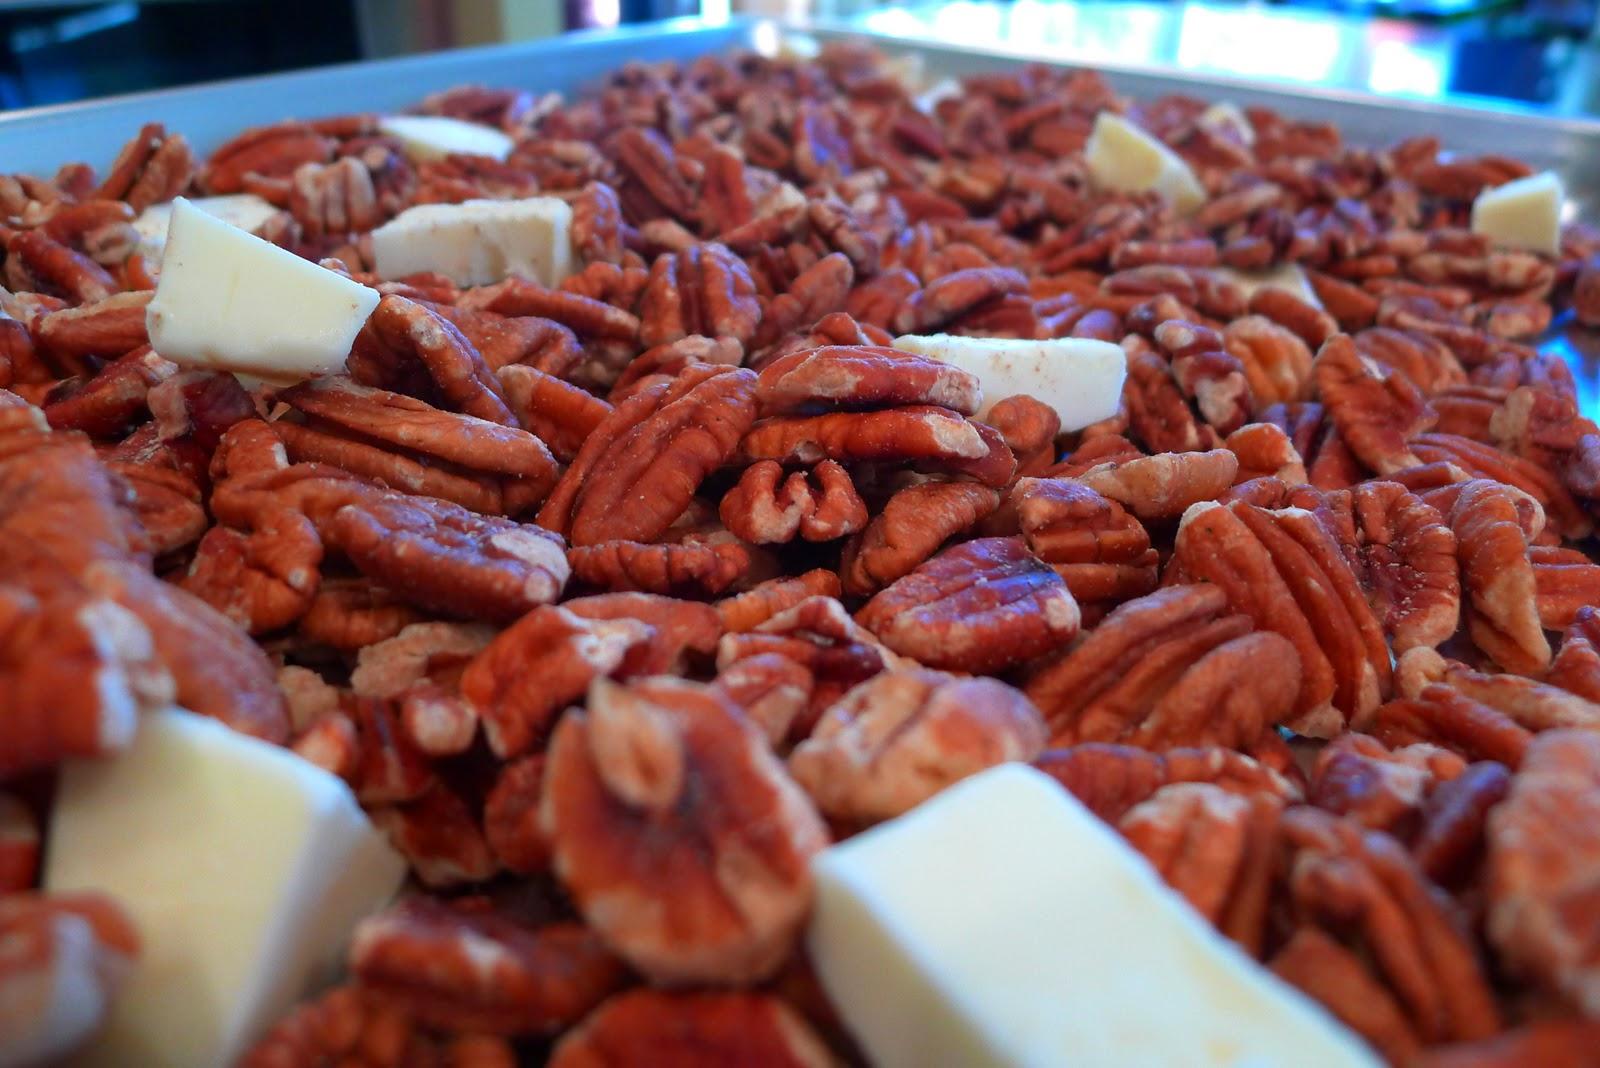 Sugartown Sweets: Roasted Pecan Clusters